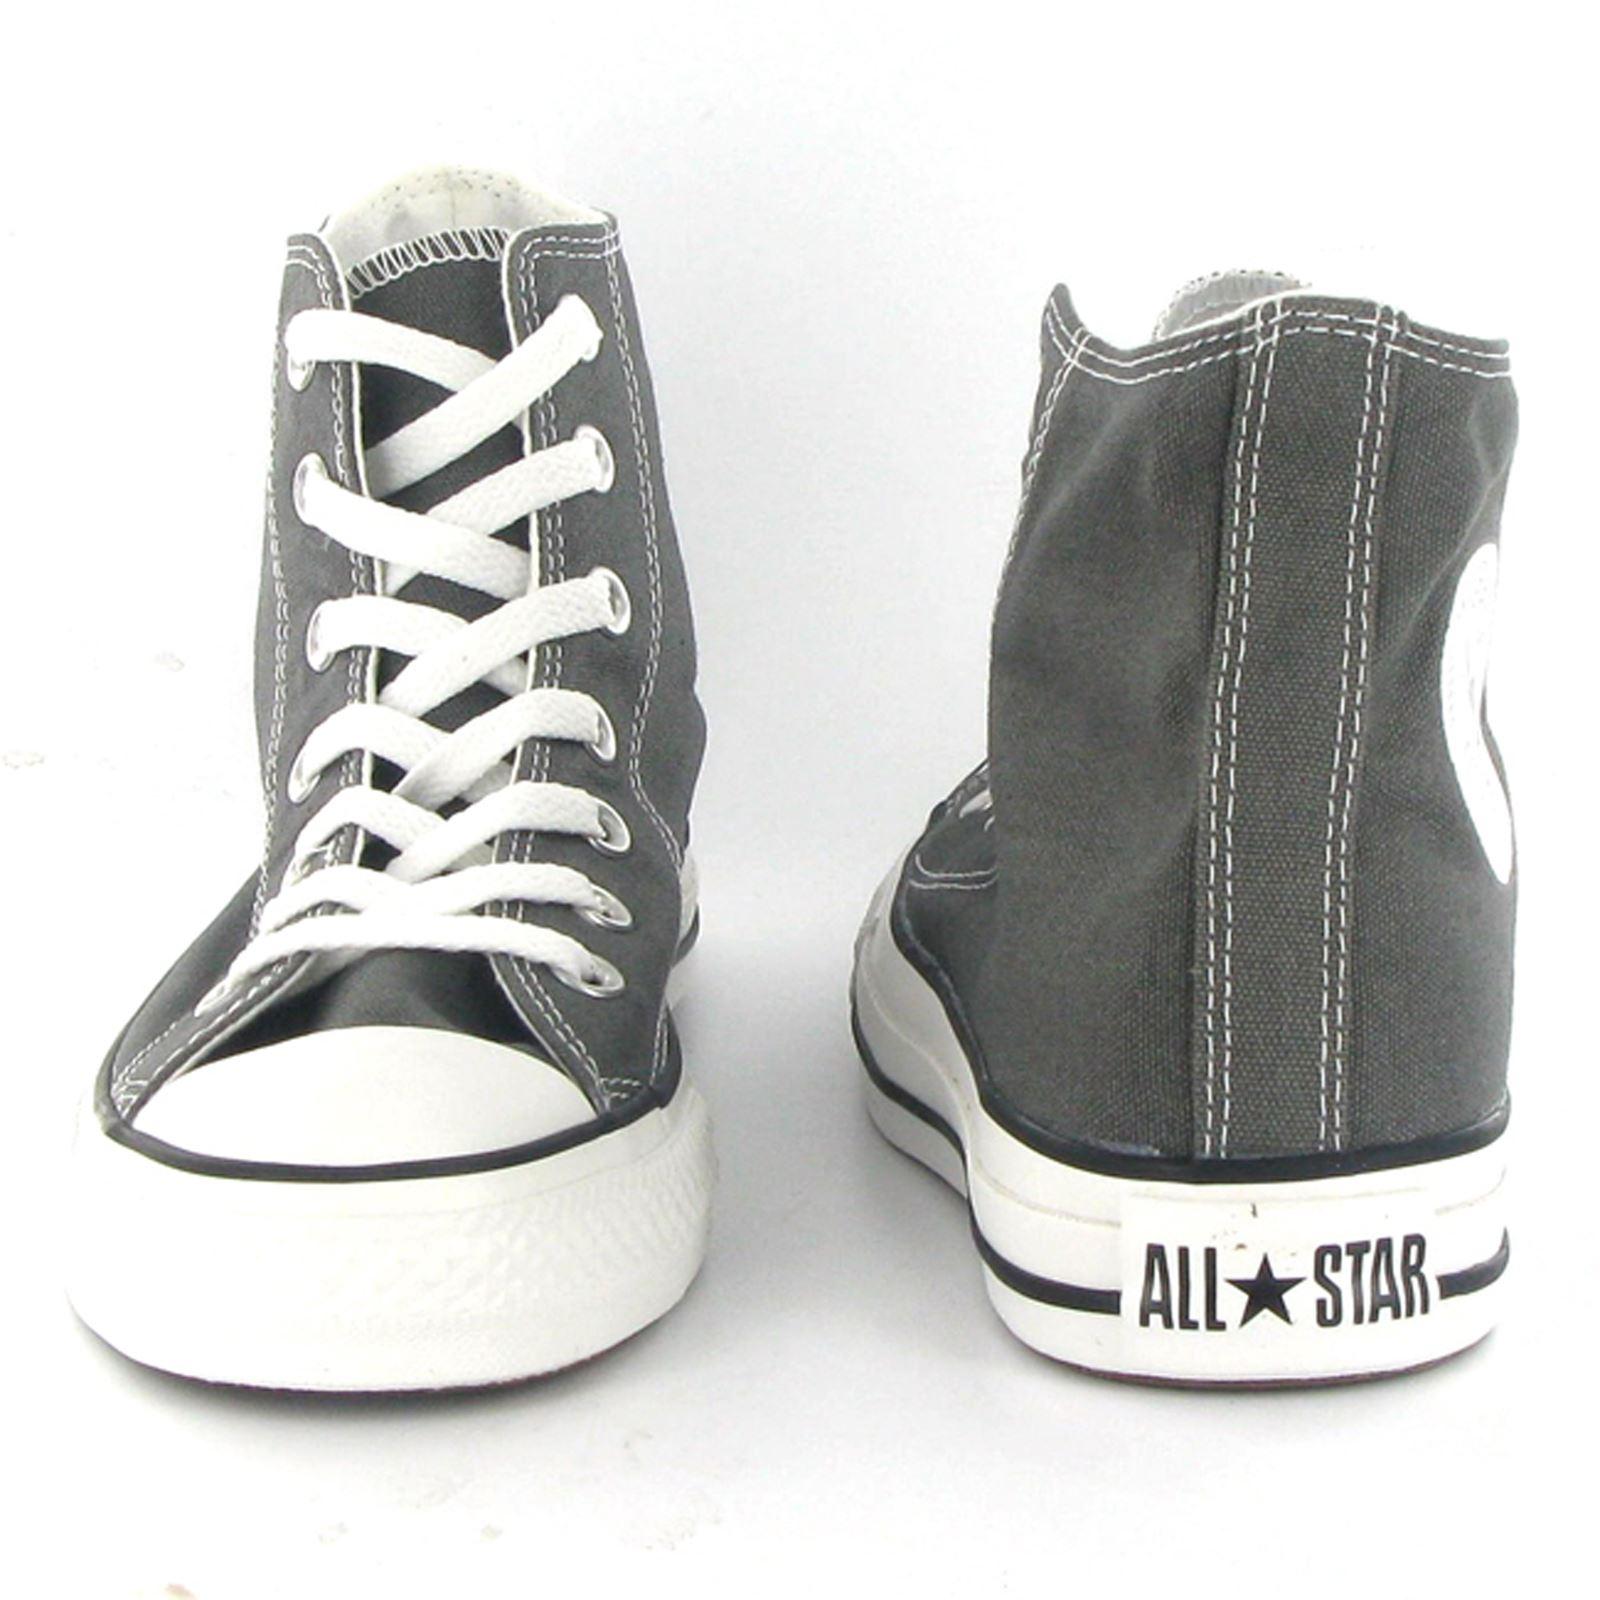 Converse-Chuck-Taylor-All-Star-Hi-Canvas-Mens-Womens-Ladies-Unisex-Trainers miniatuur 23